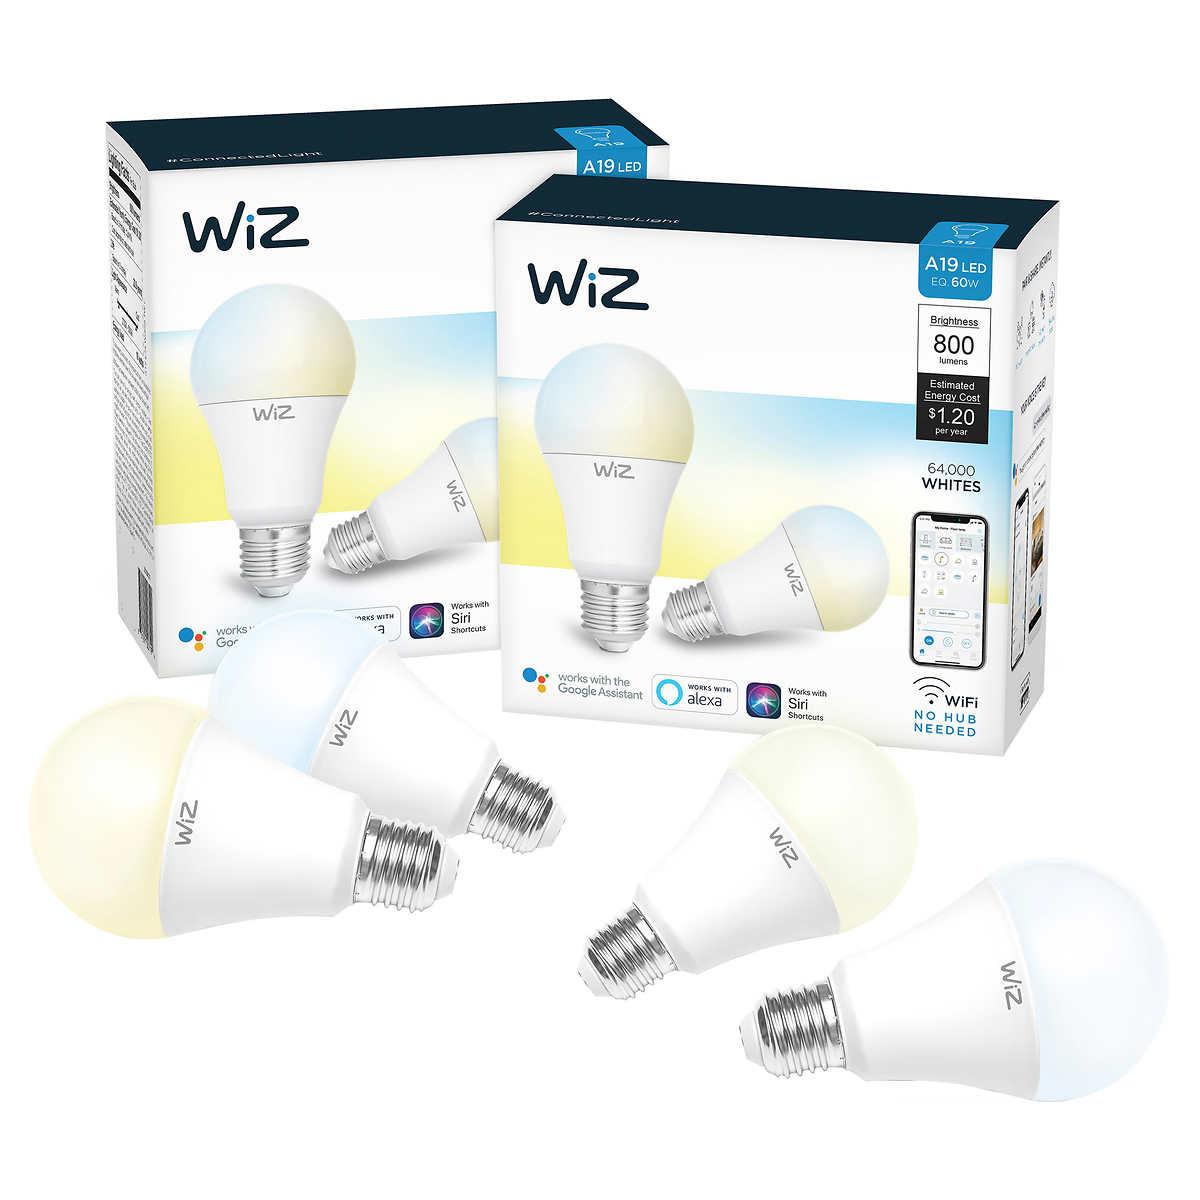 WiZ WiFi Smart Bulb A-19 White, 4-pack